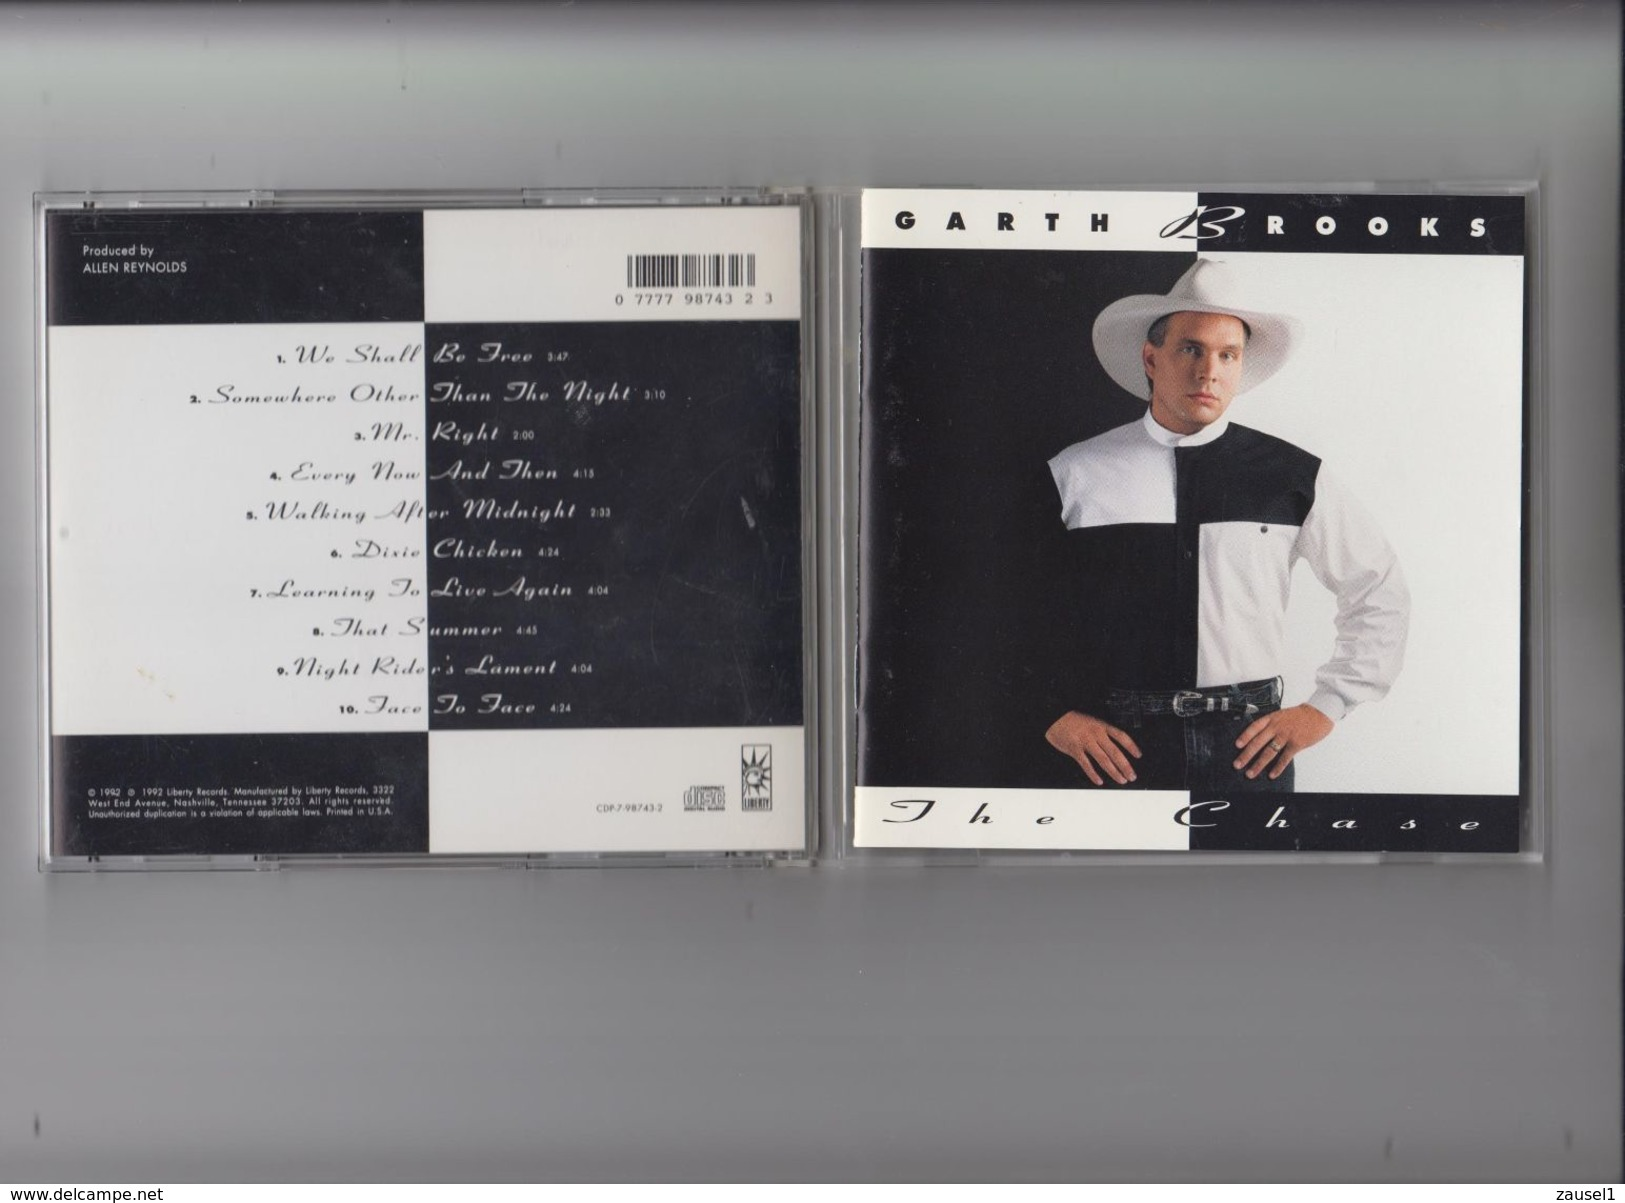 Garth Brooks - The Chase - Original CD - Country & Folk